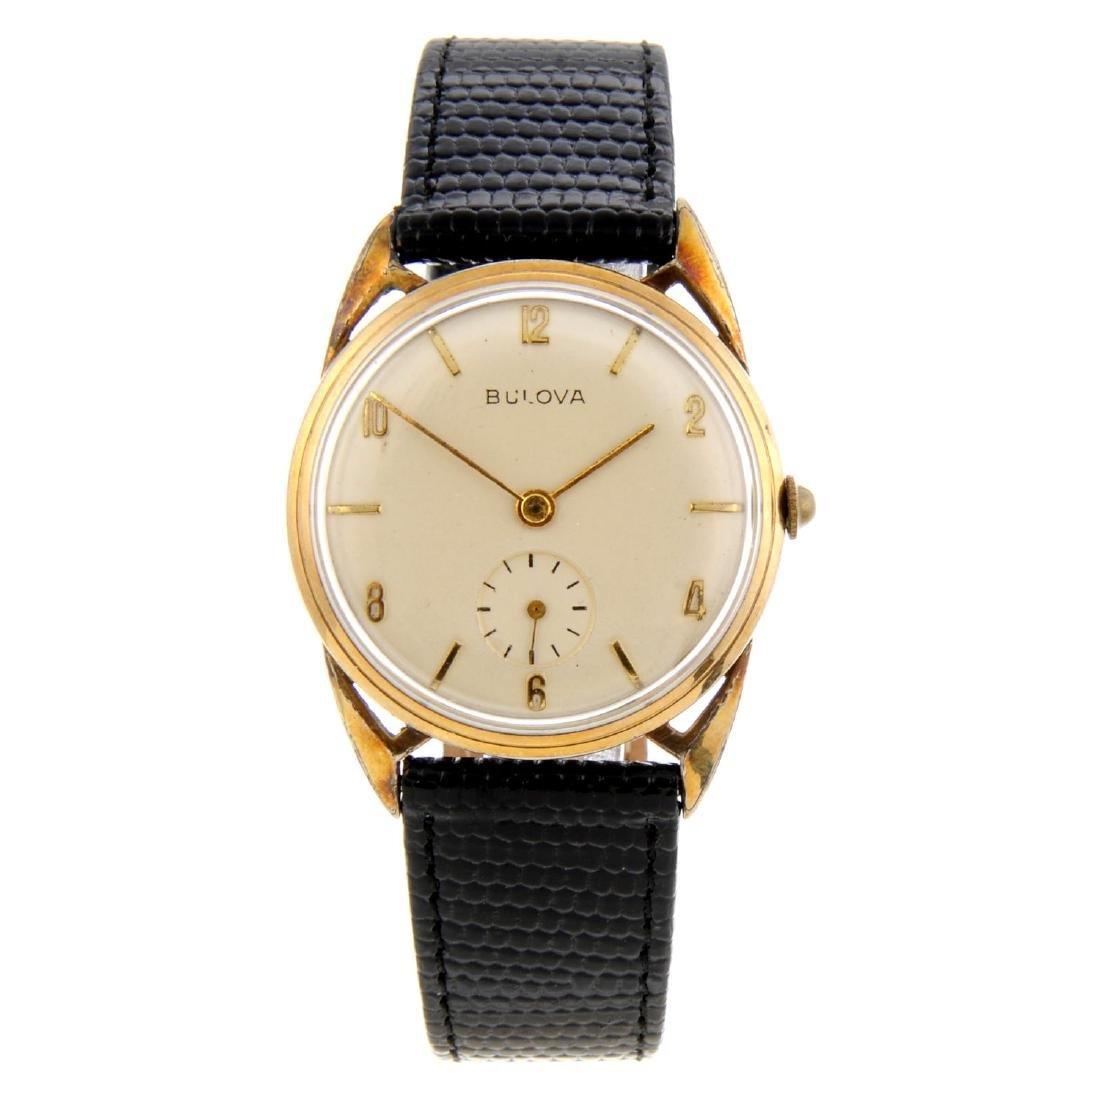 BULOVA - a gentleman's wrist watch. Rolled gold case.